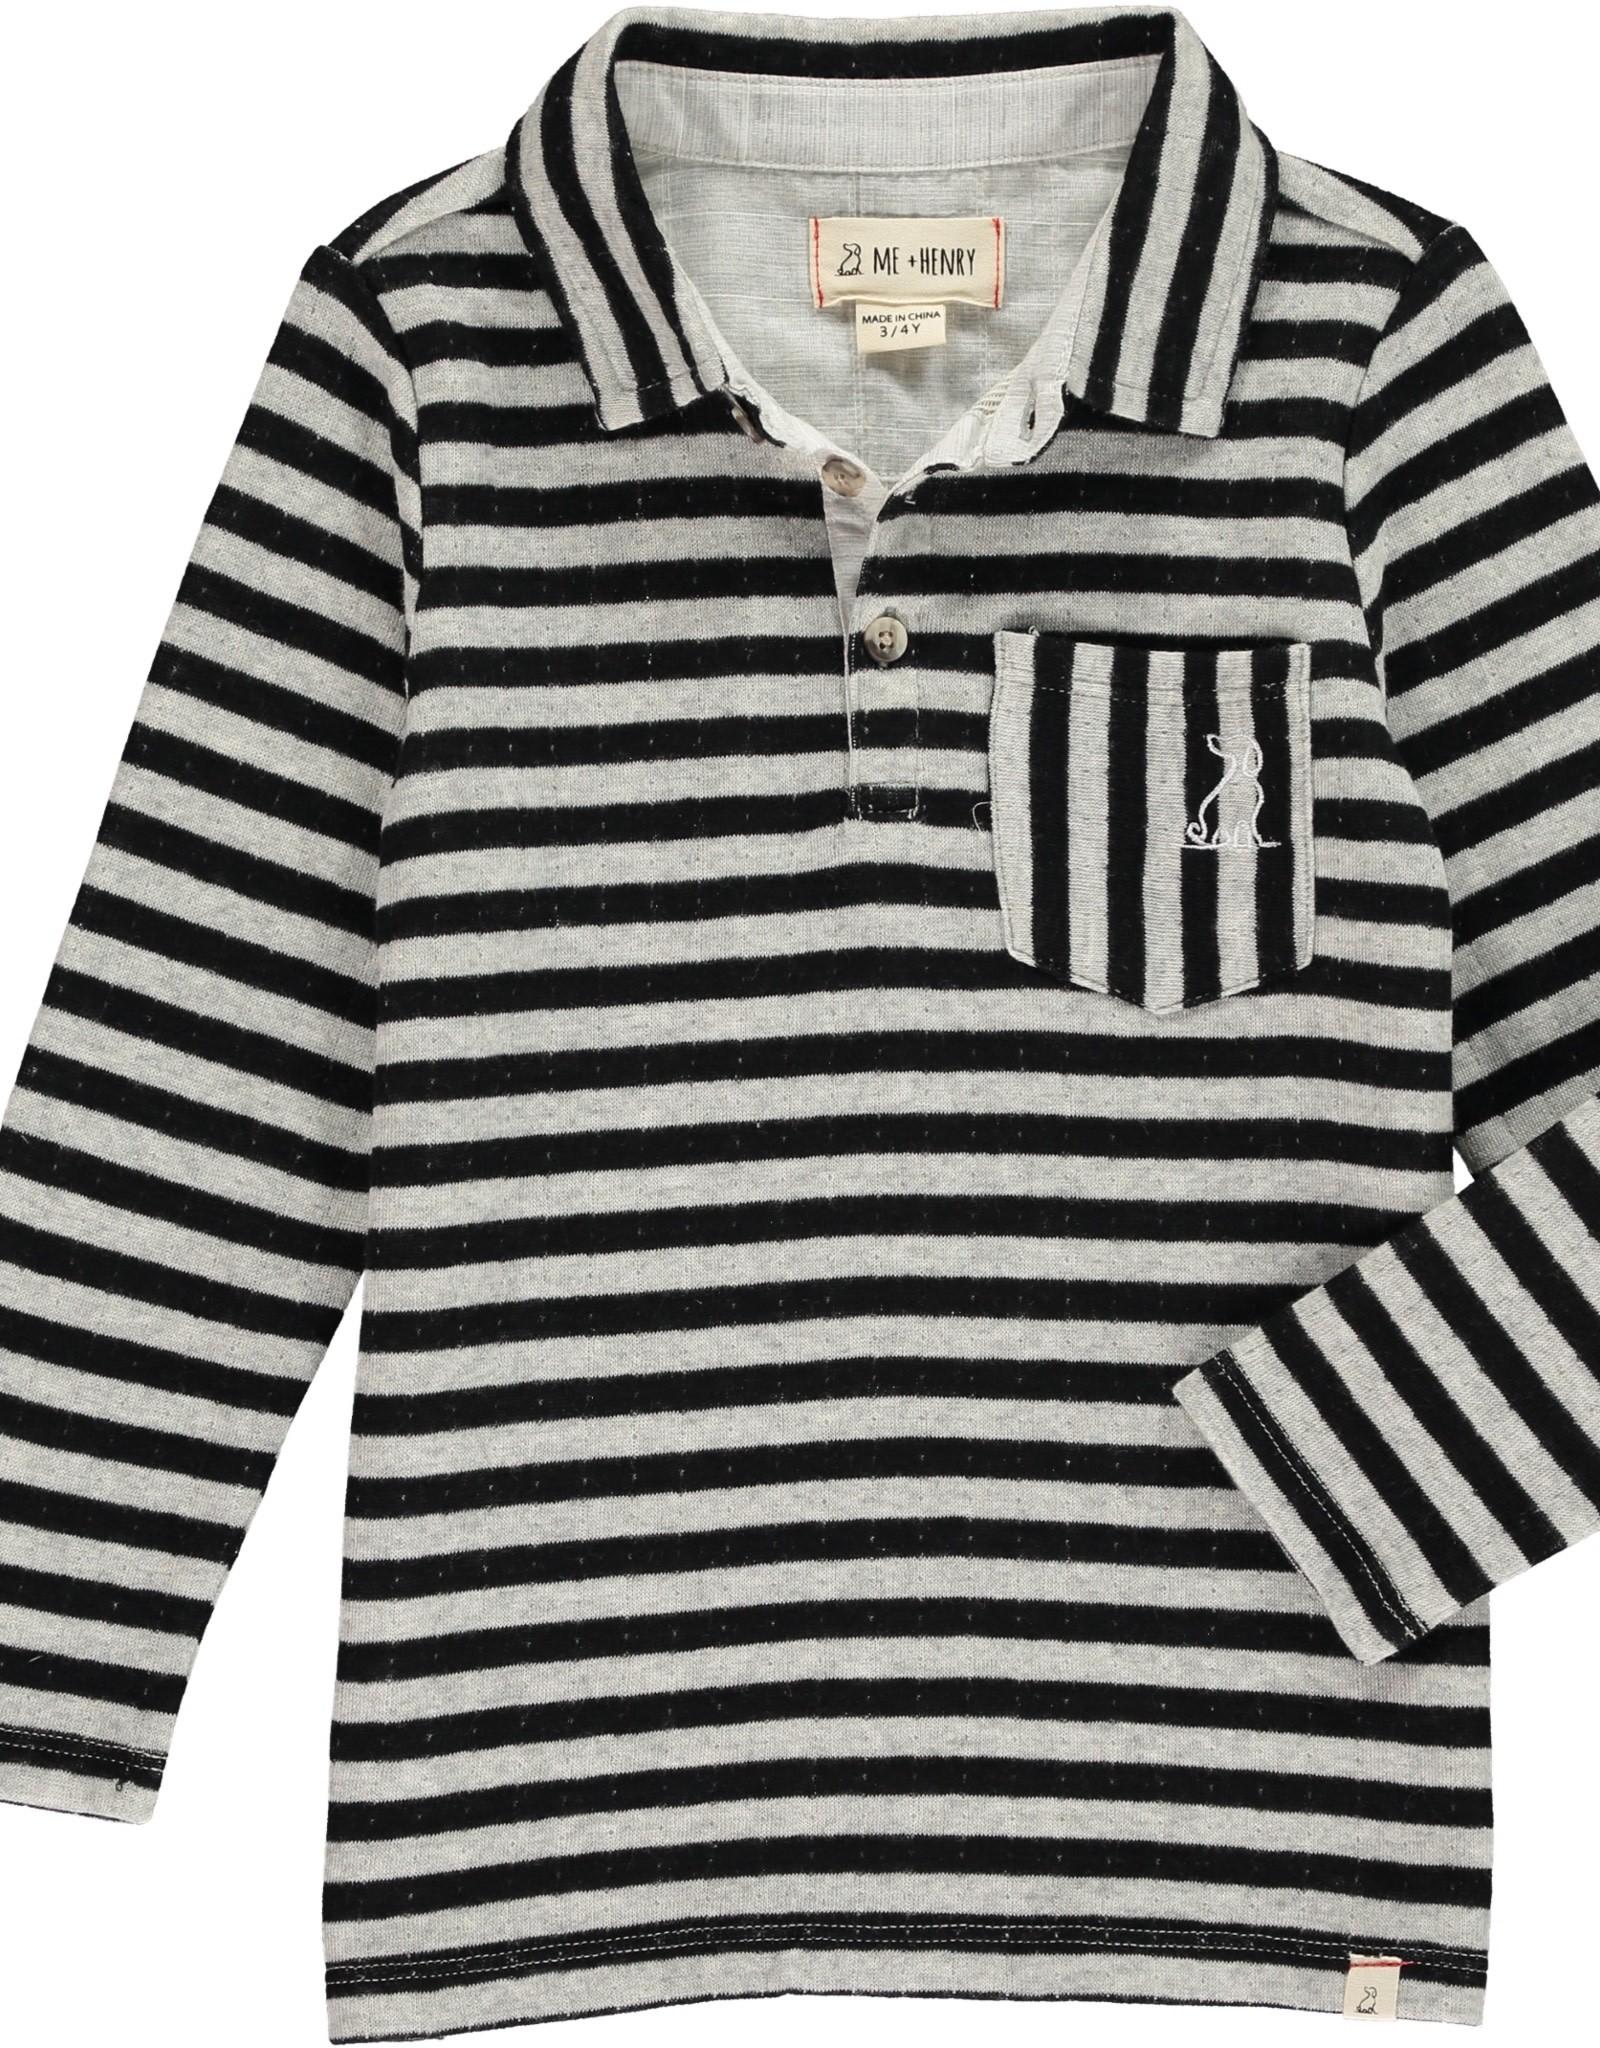 Black/grey stripe polo